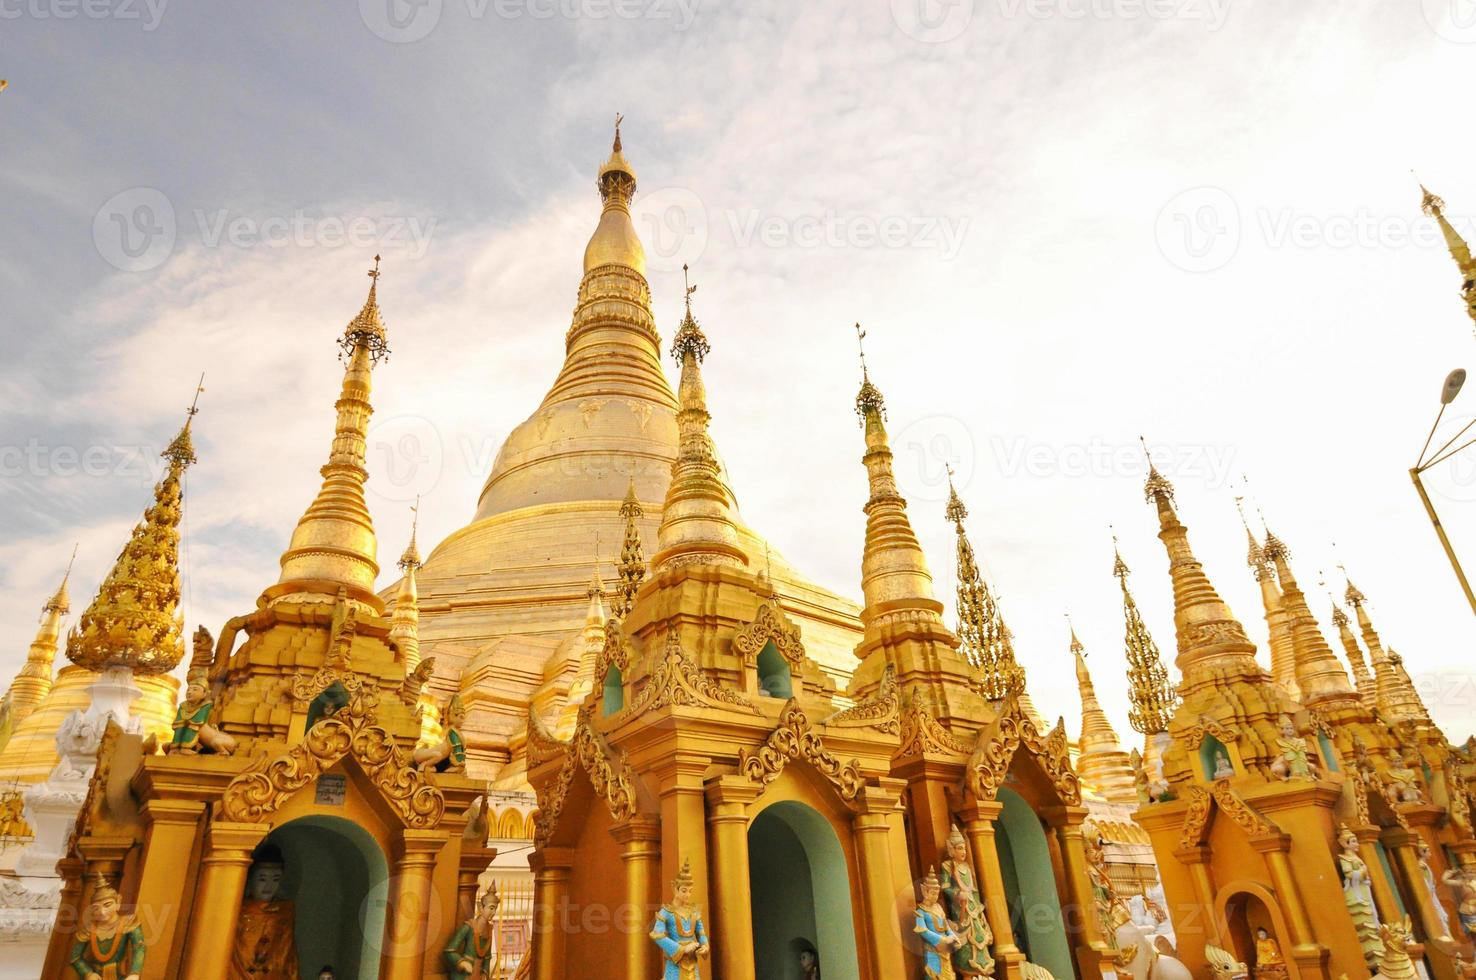 Shwedagon Paya in Yangon, Myanmar photo